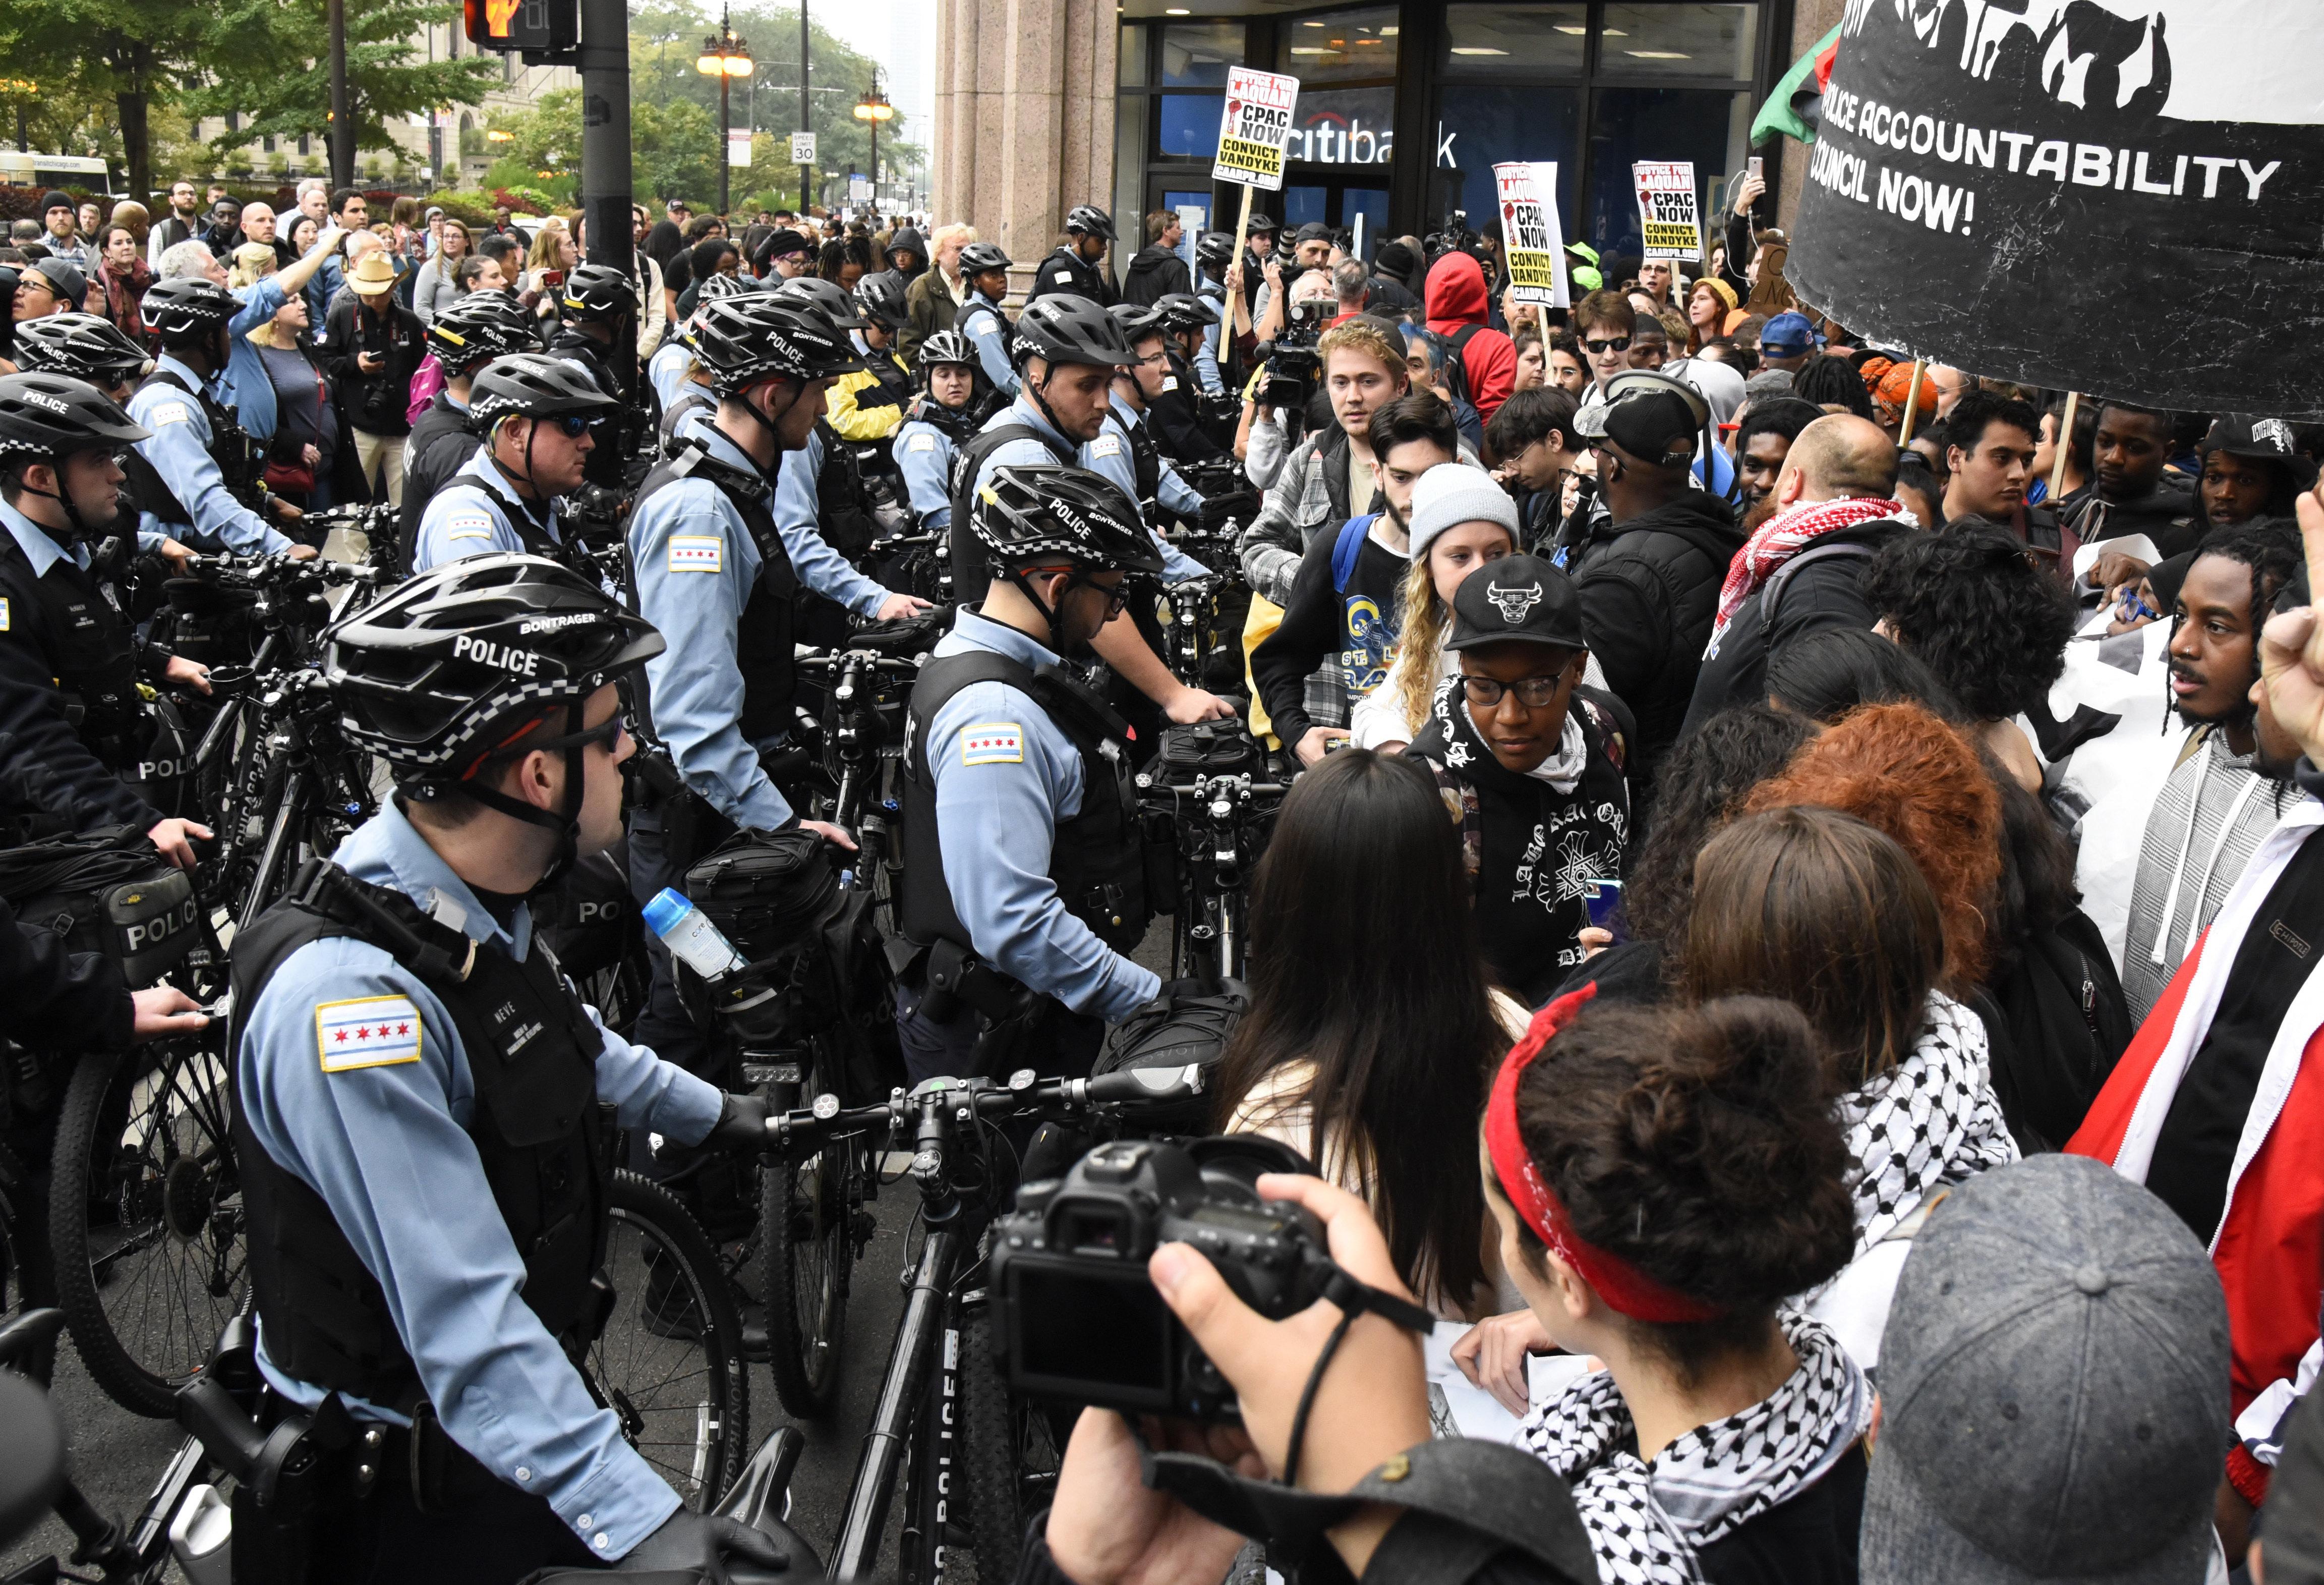 Chicago verdict raises hope of greater police accountability